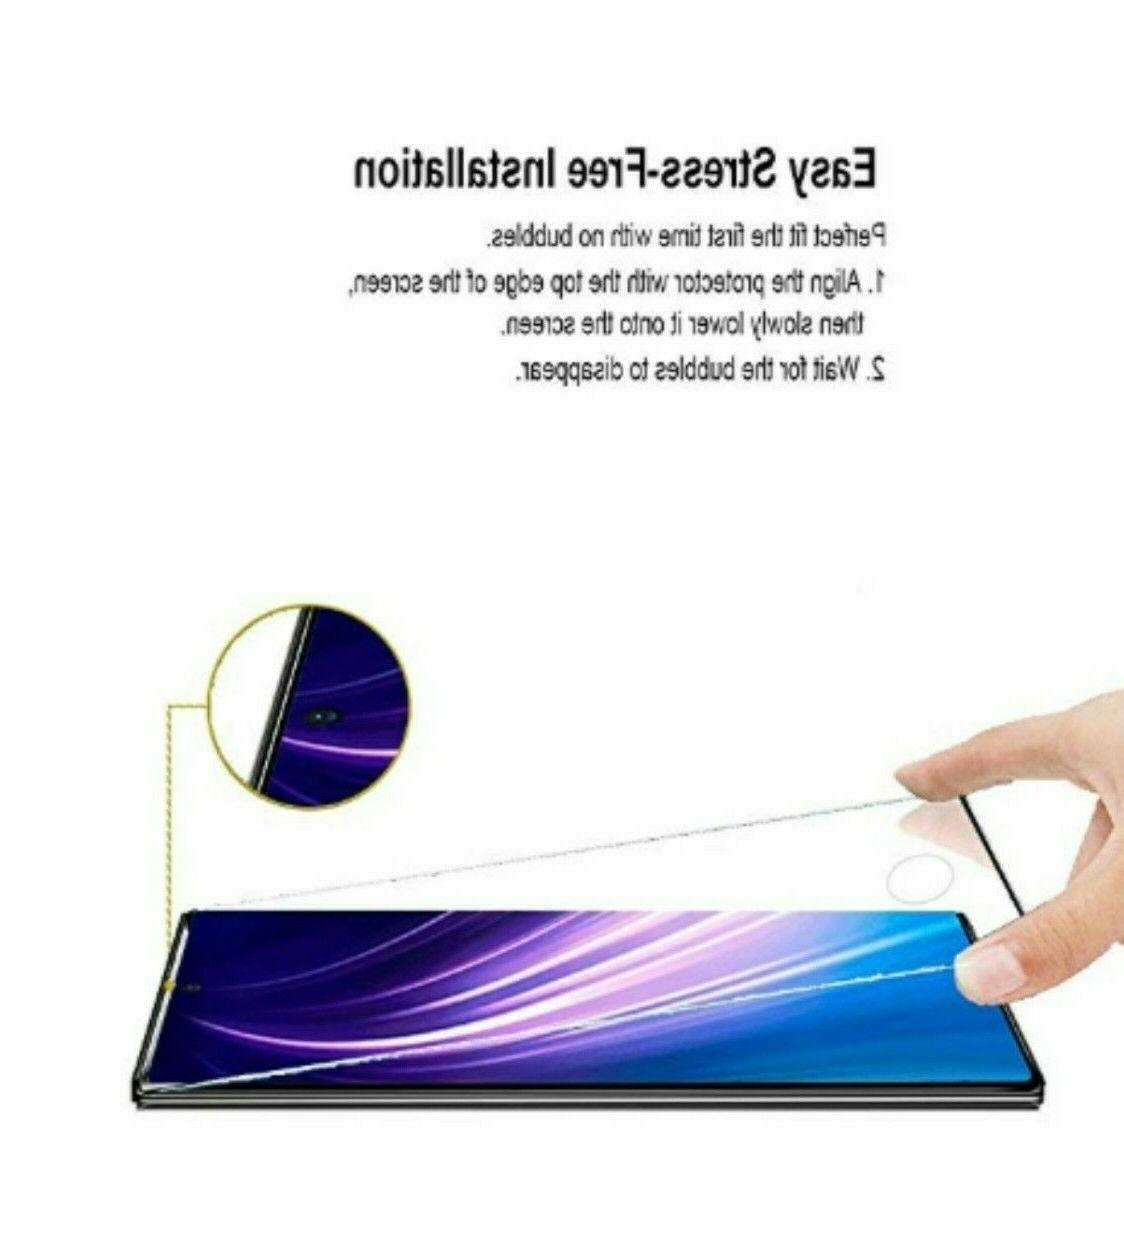 3x Tempered Glass Galaxy S10 Plus/N10+/S10e